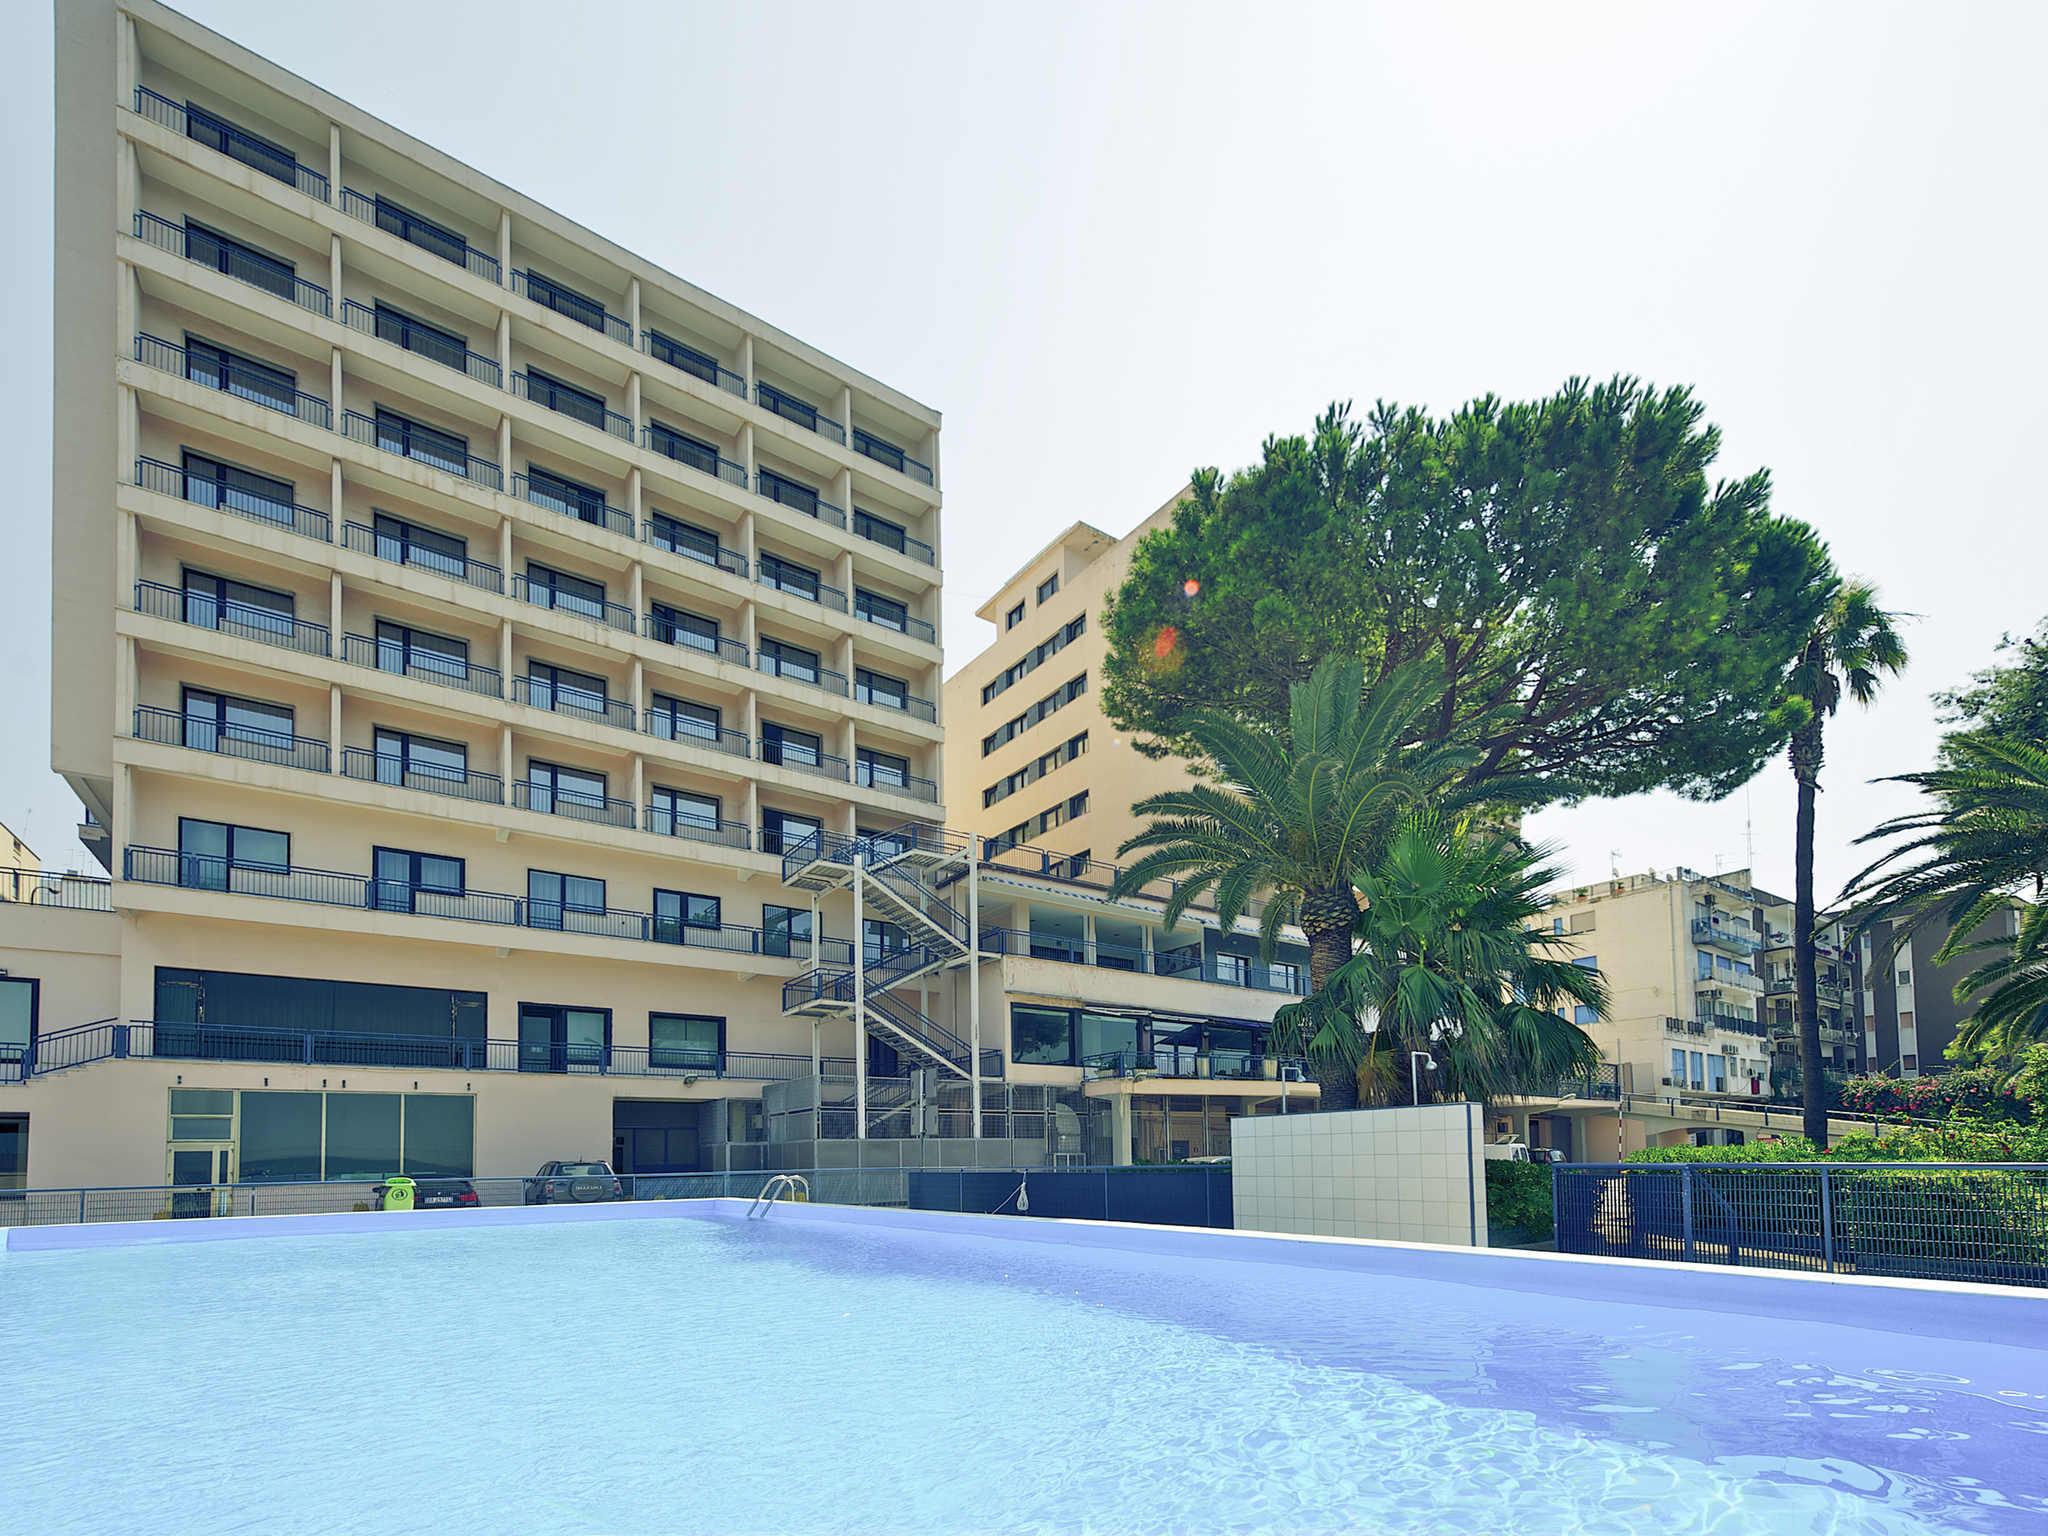 Отель — Mercure Delfino Taranto